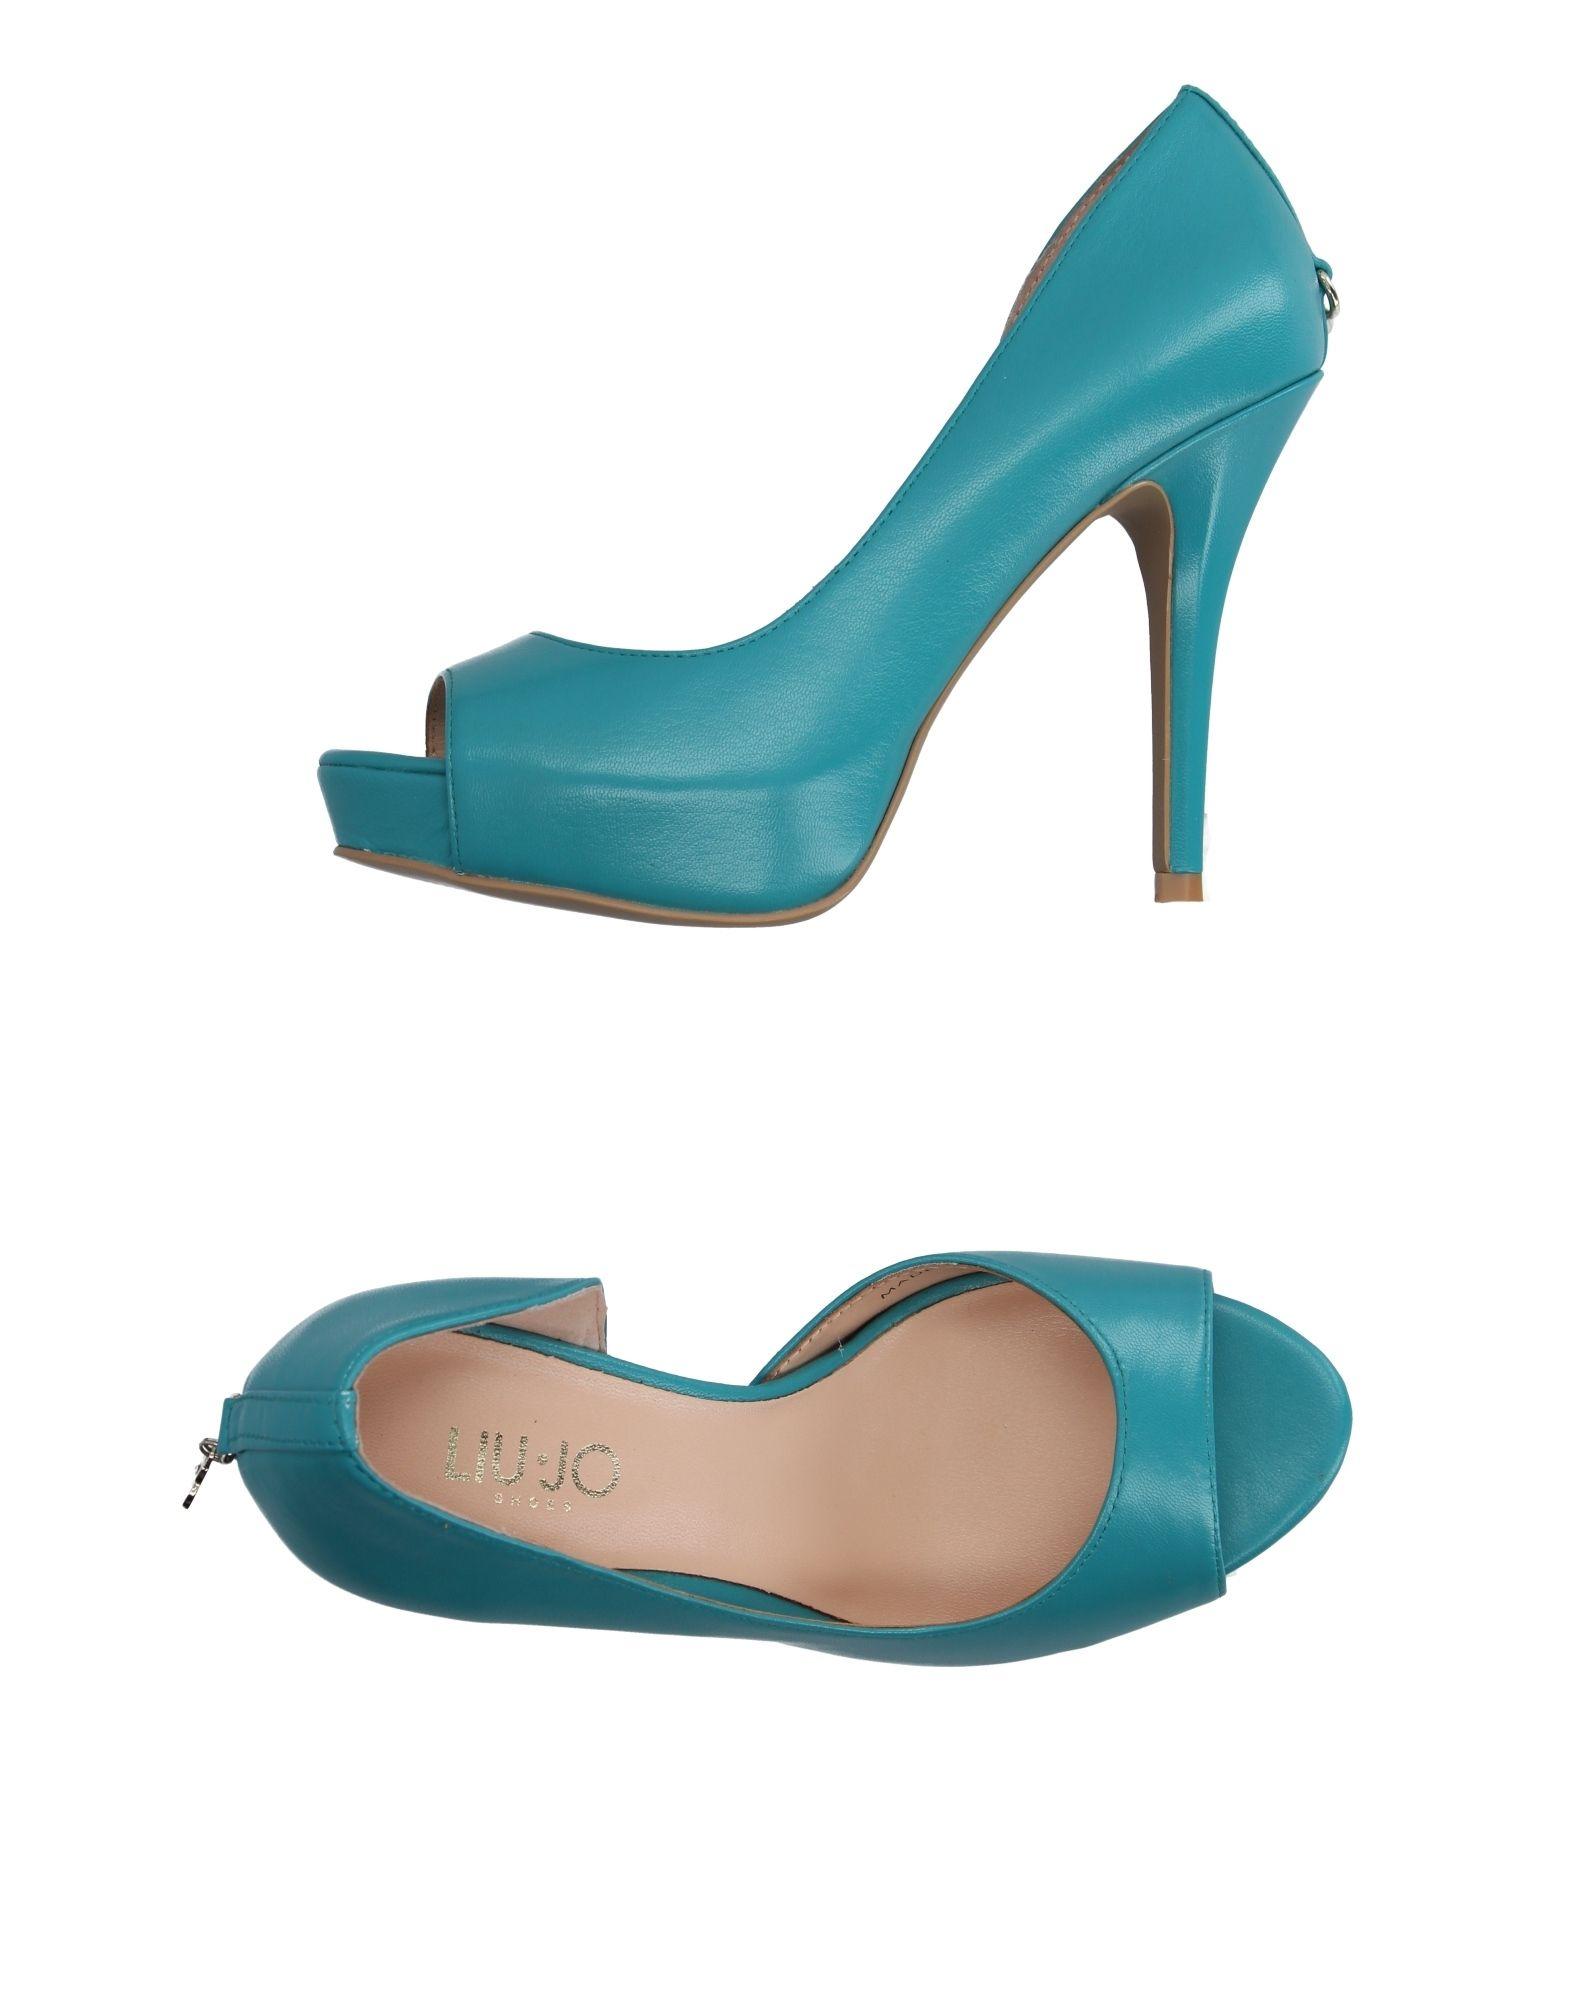 Escarpins Liu •Jo Shoes Femme - Escarpins Liu •Jo Shoes sur